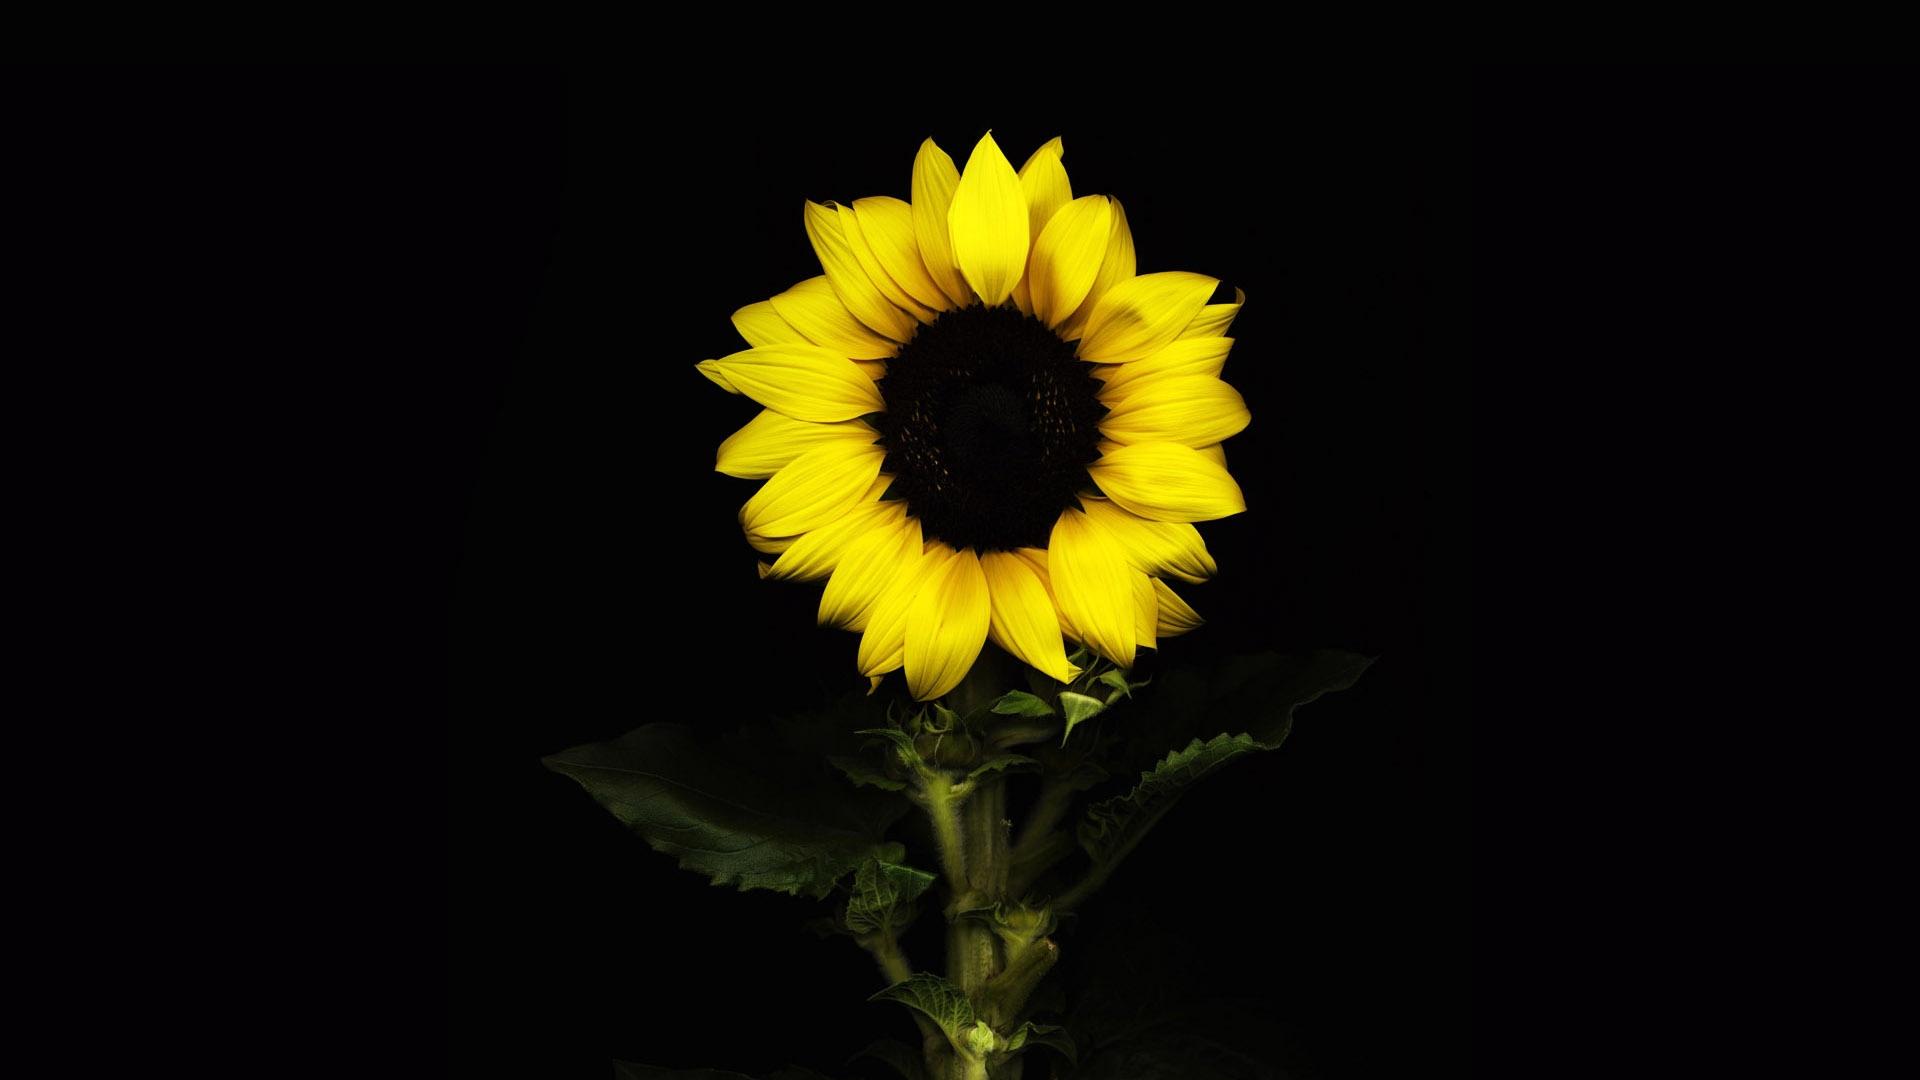 Free Photo Sunflower On Black